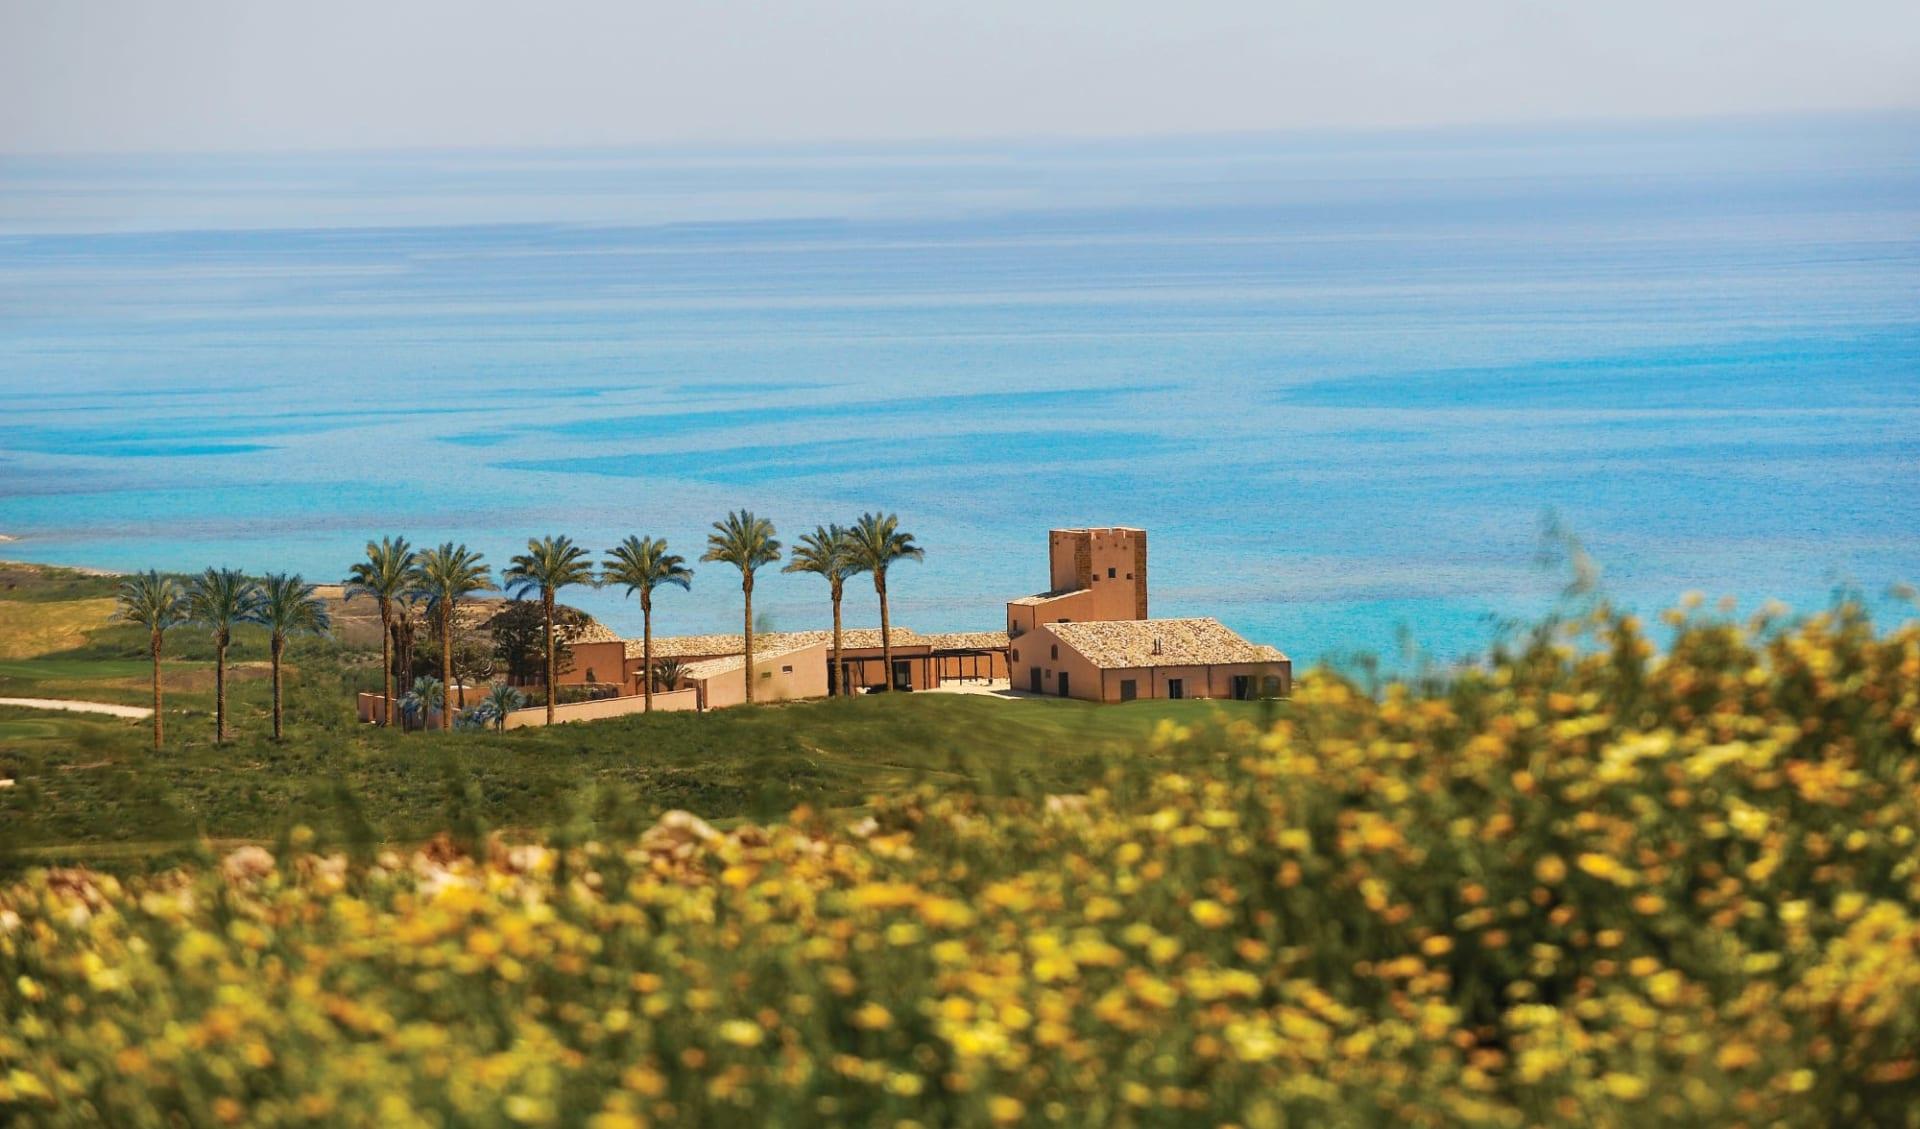 Verdura Resort in Sciacca: Verdura-Golf-&-Spa-Resort-4256x2832